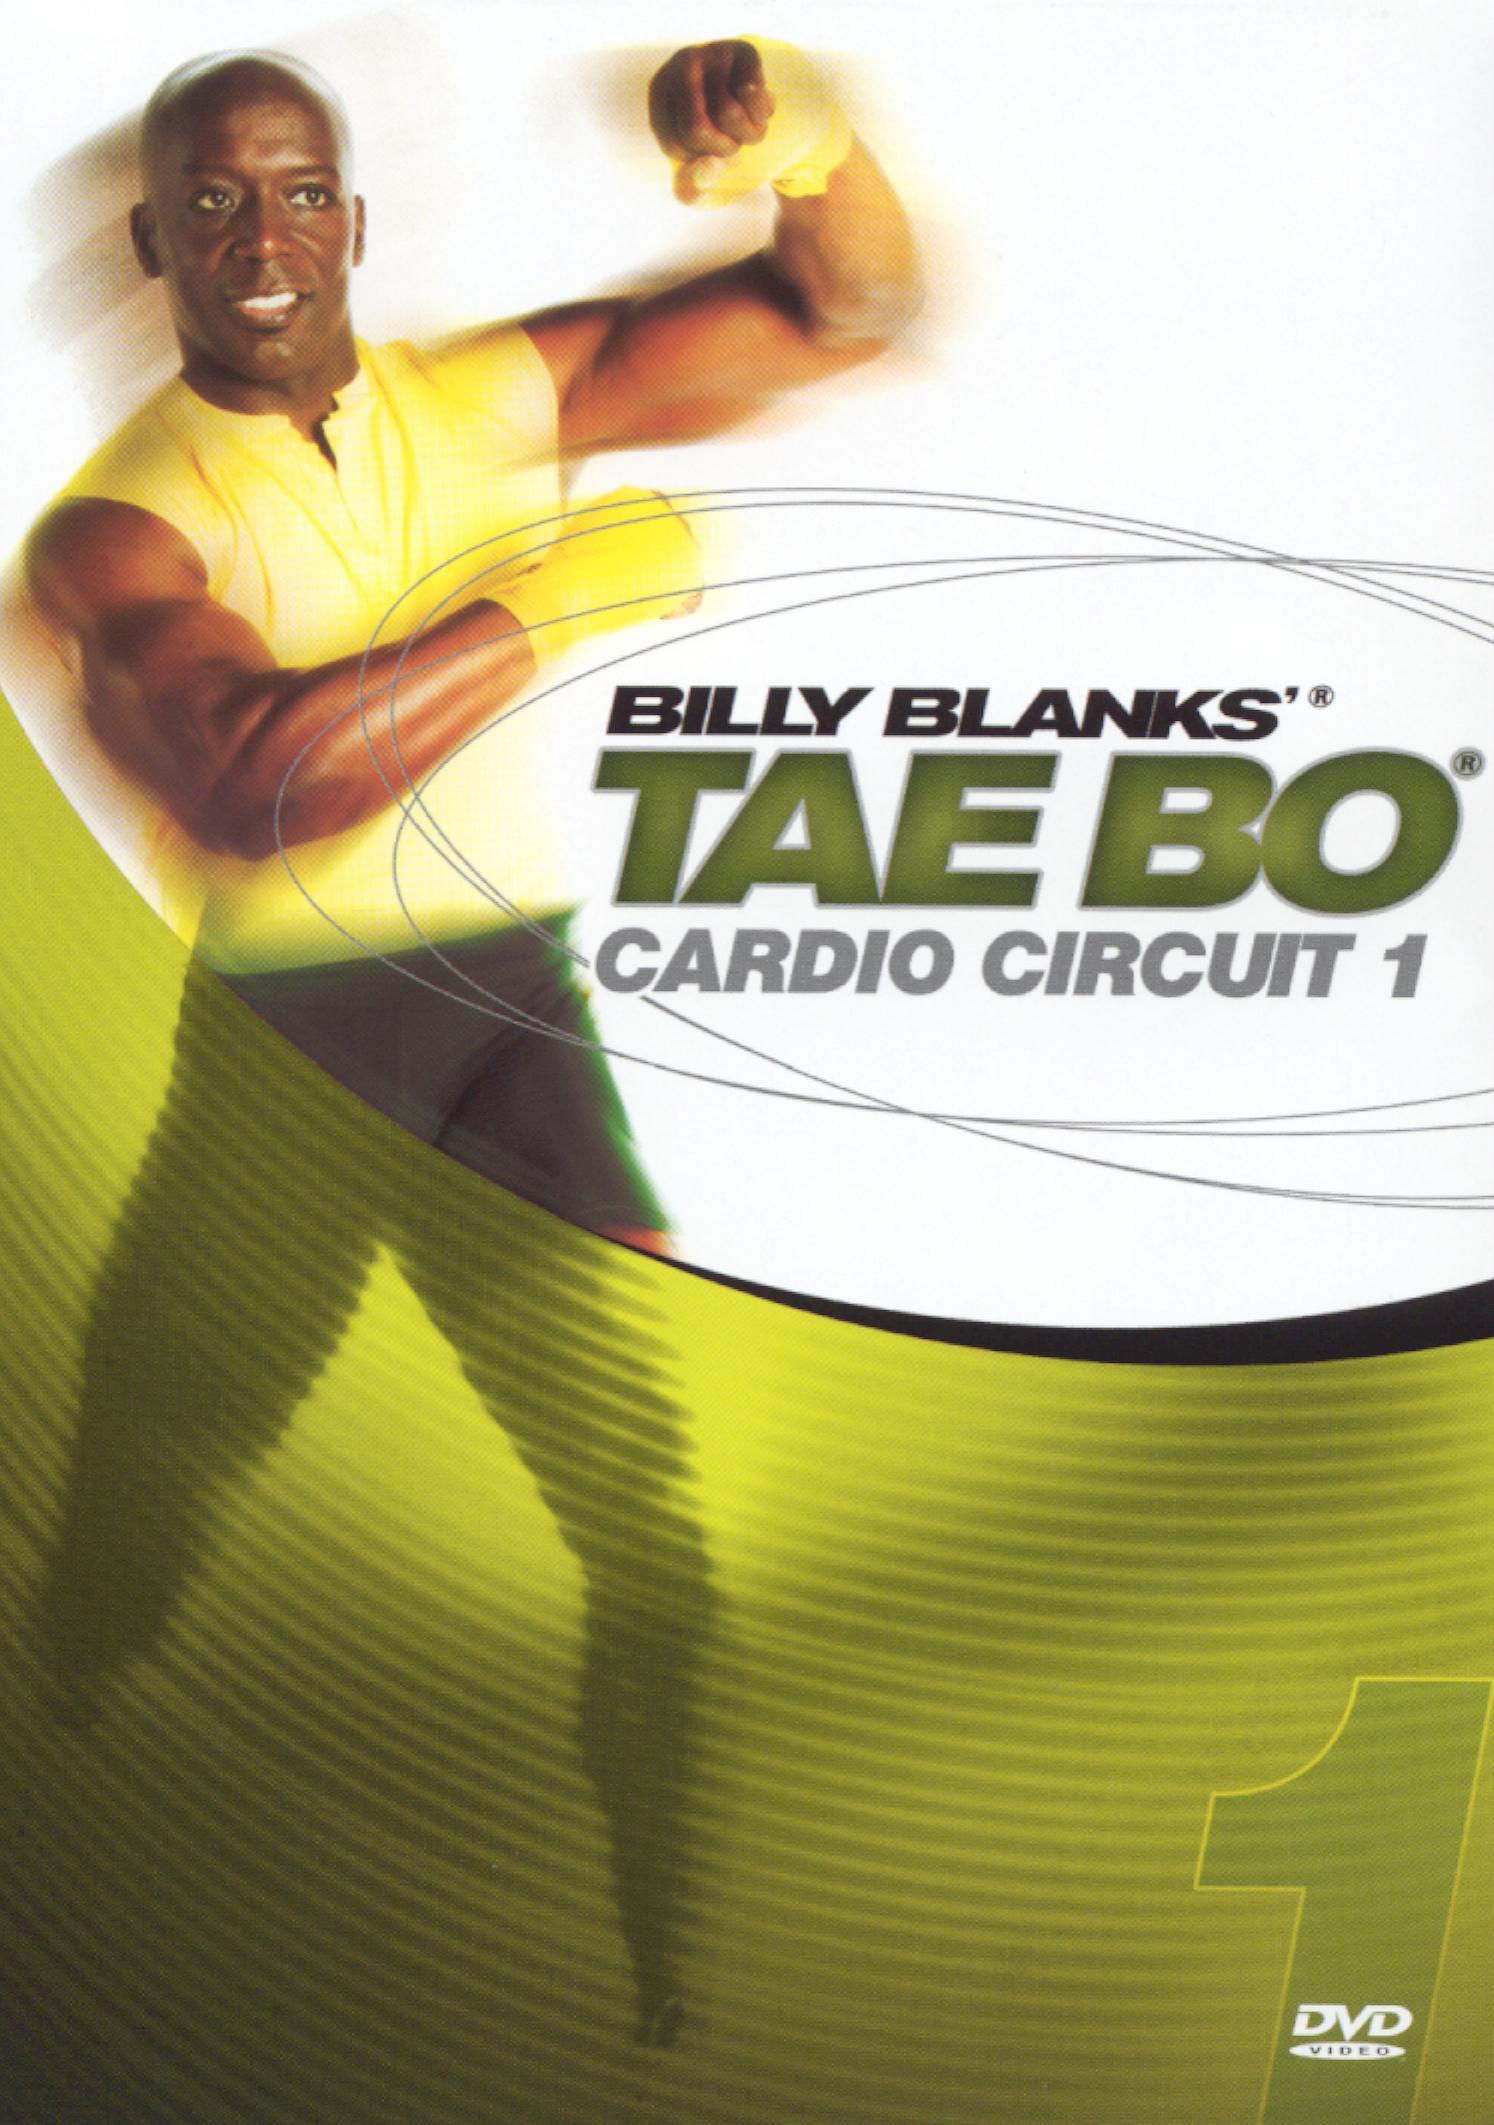 Billy Blanks: Tae Bo Cardio Circuit 1